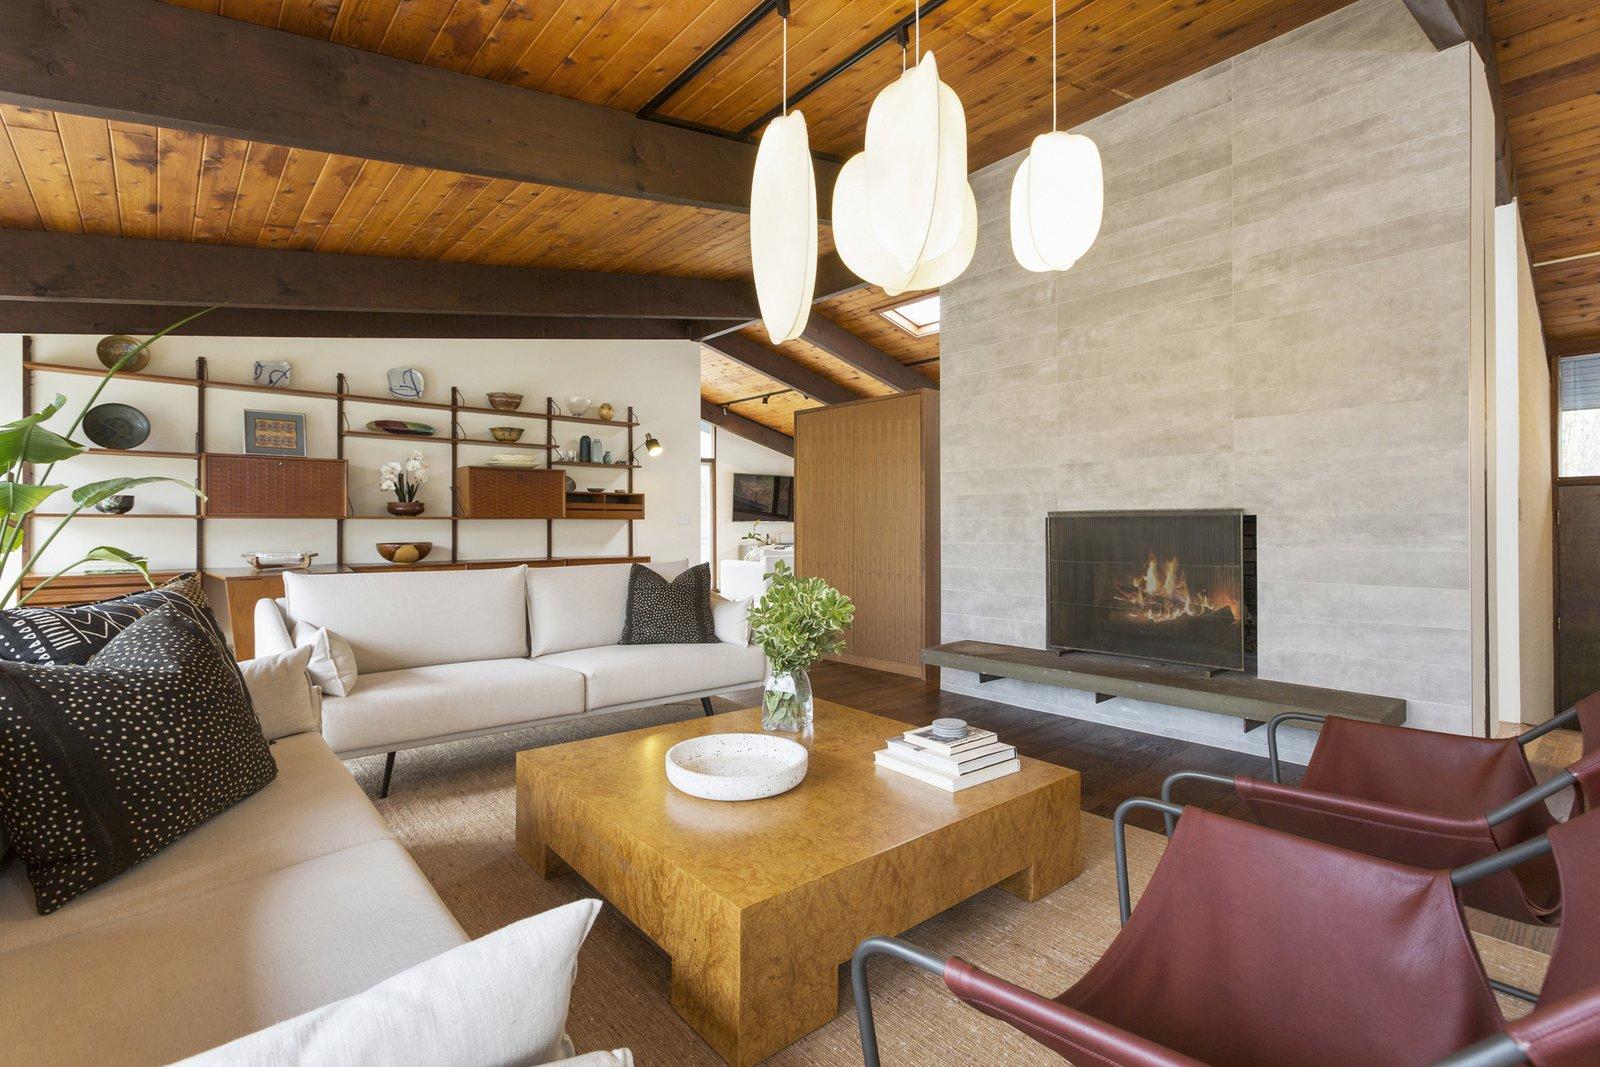 Westport Connecticut Midcentury Home living area